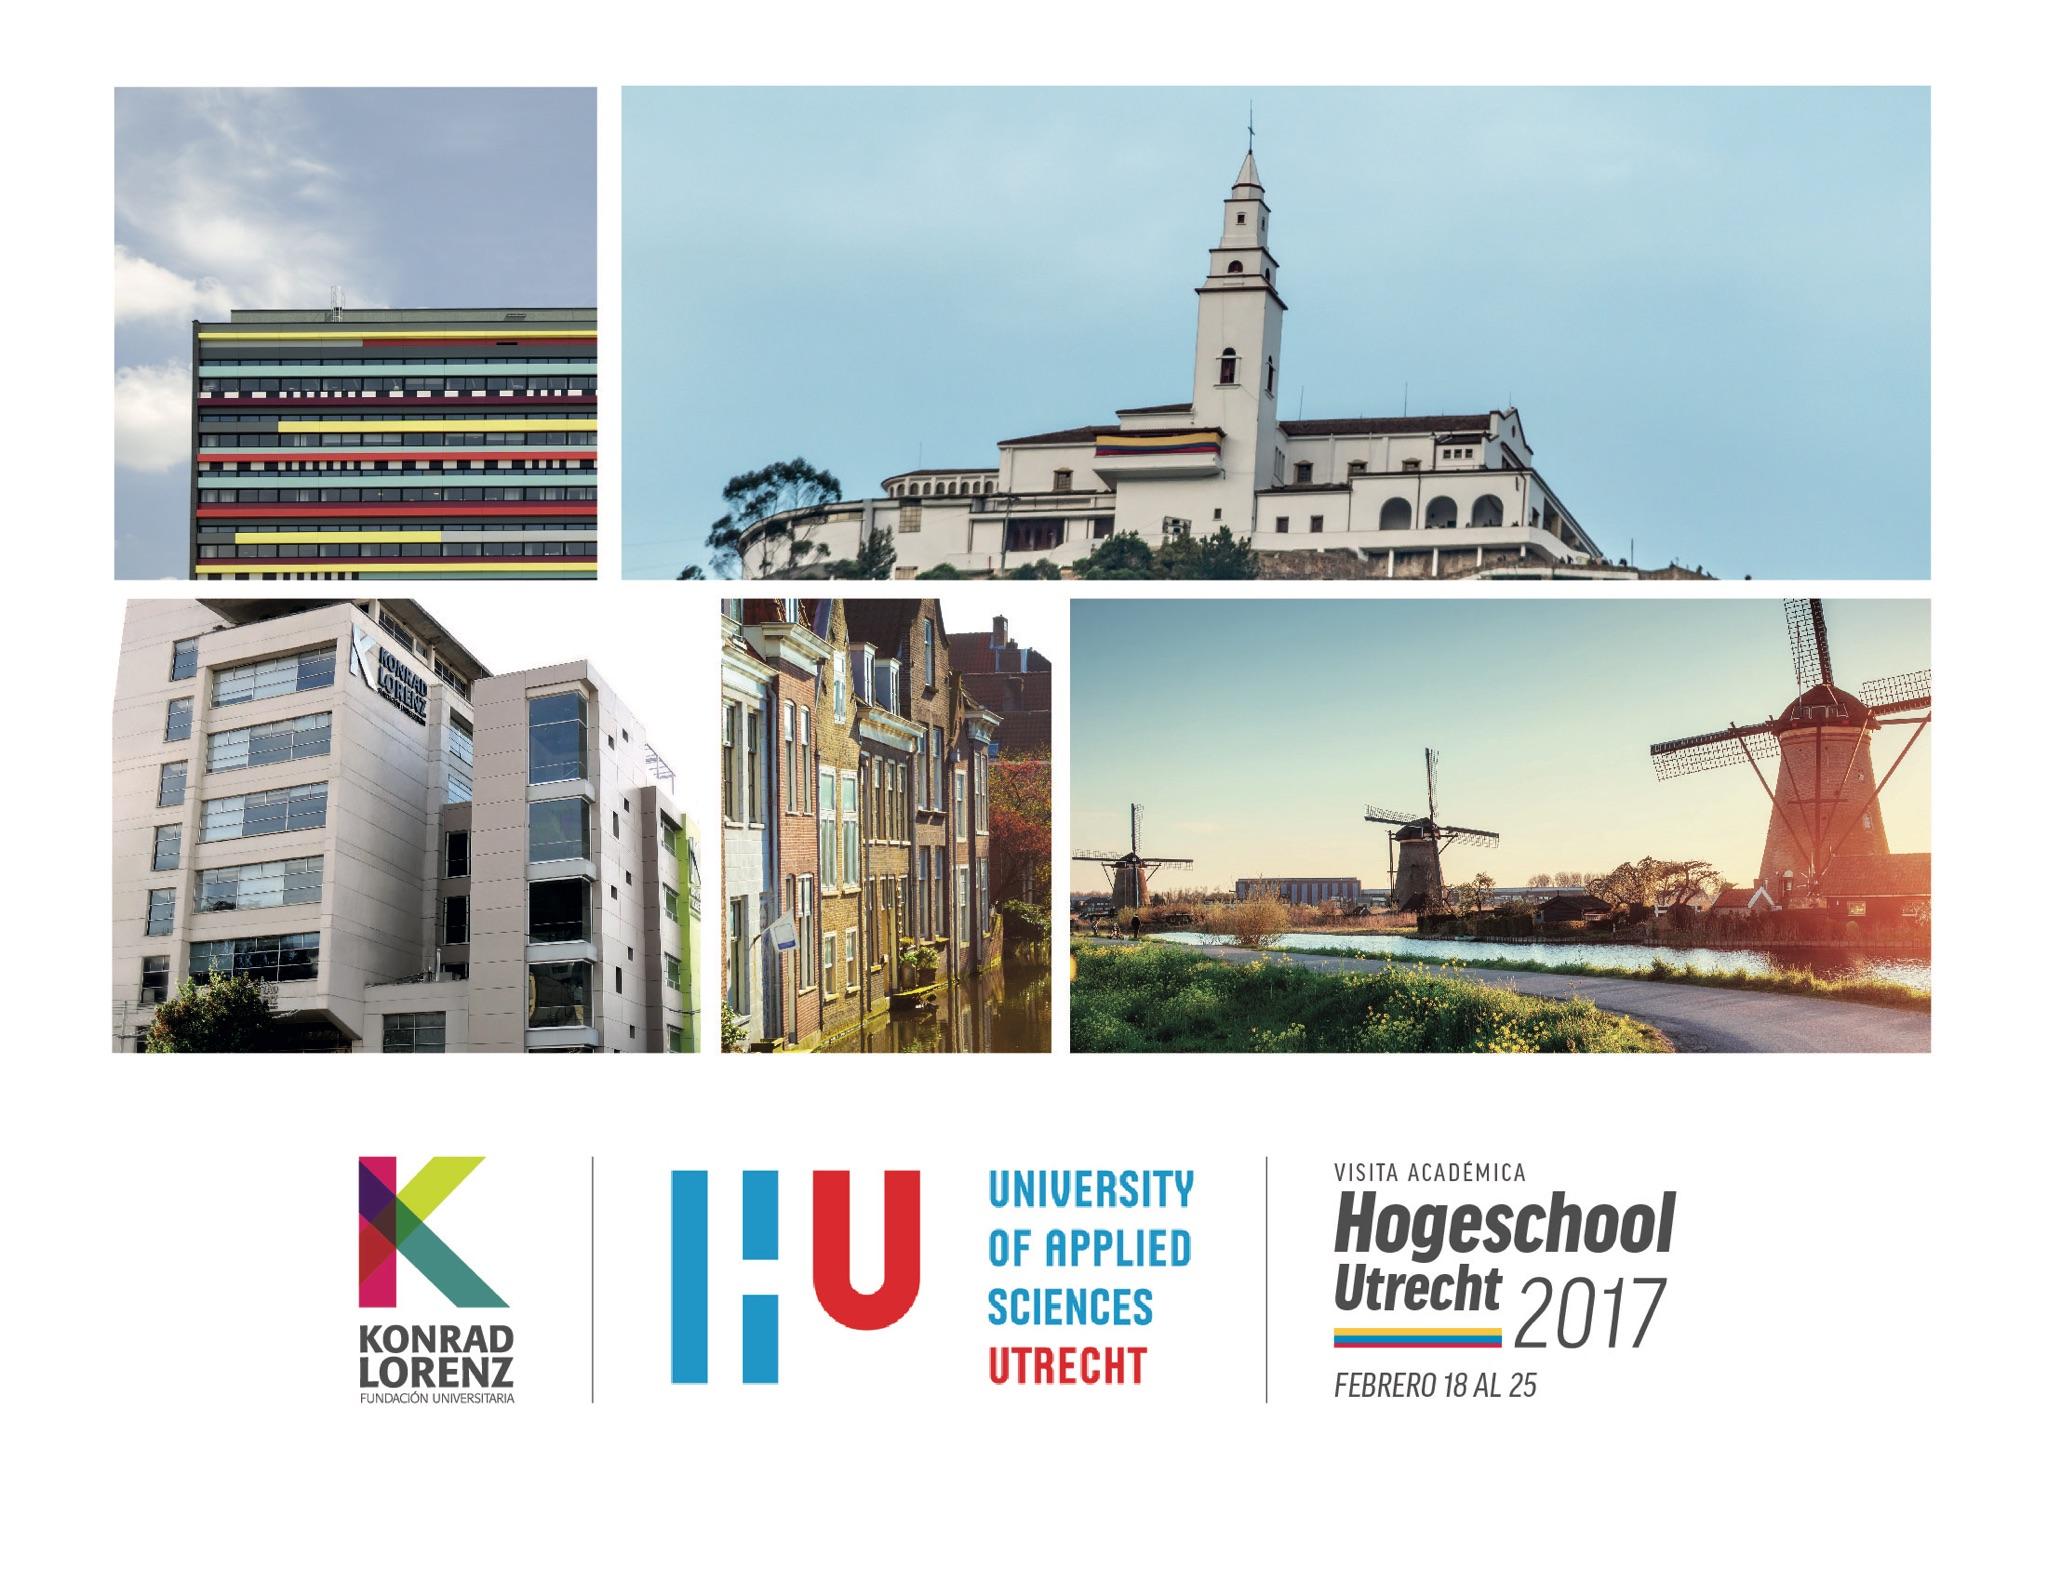 Visita académica Hogeschool Utrecht 2017